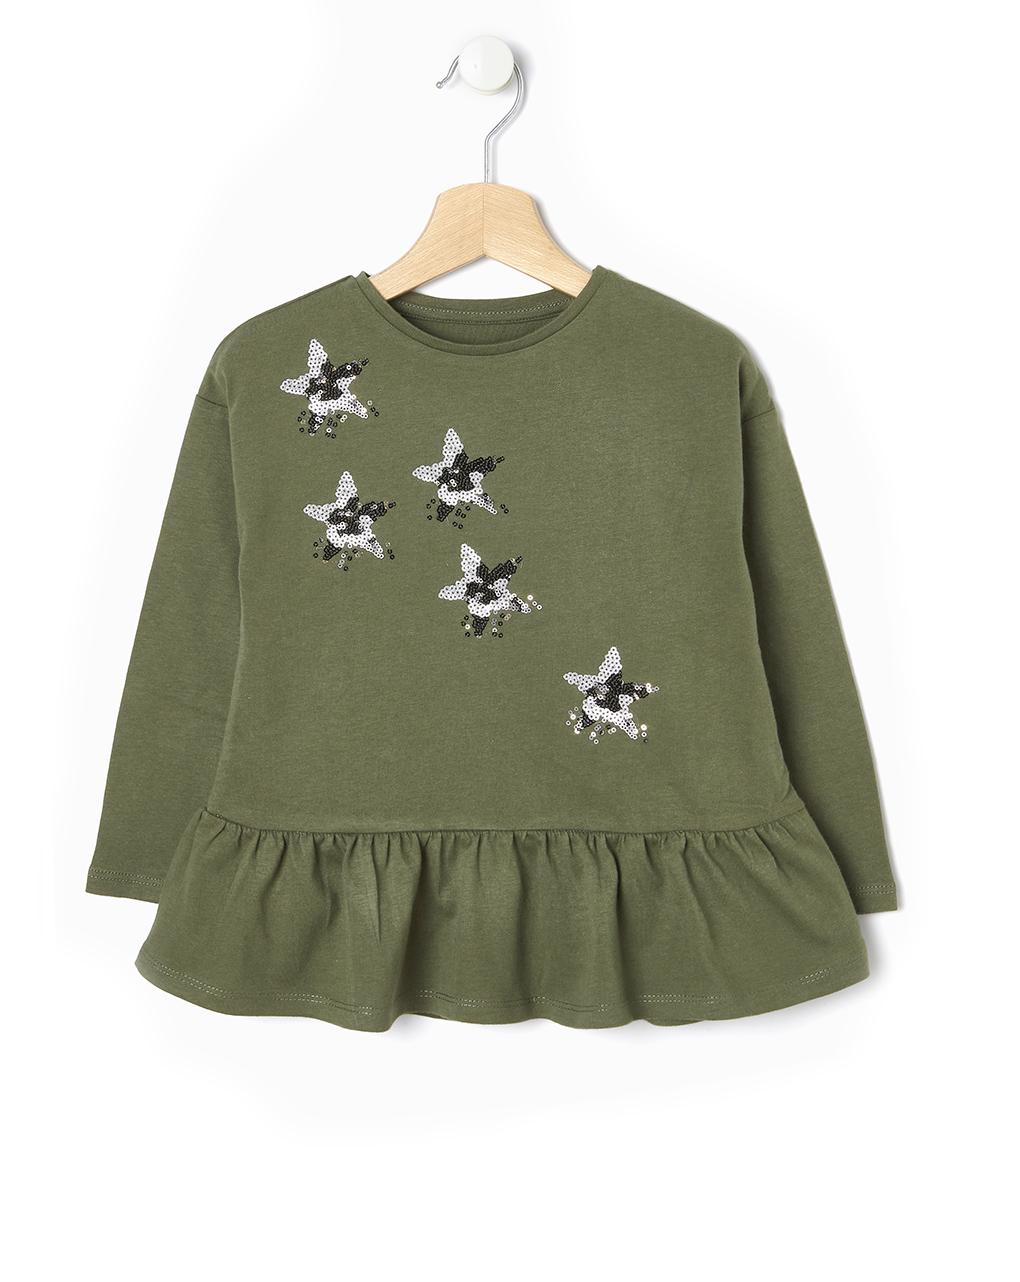 Maxi t-shirt Χακί με Αστεράκια από Παγιέτες για Κορίτσι